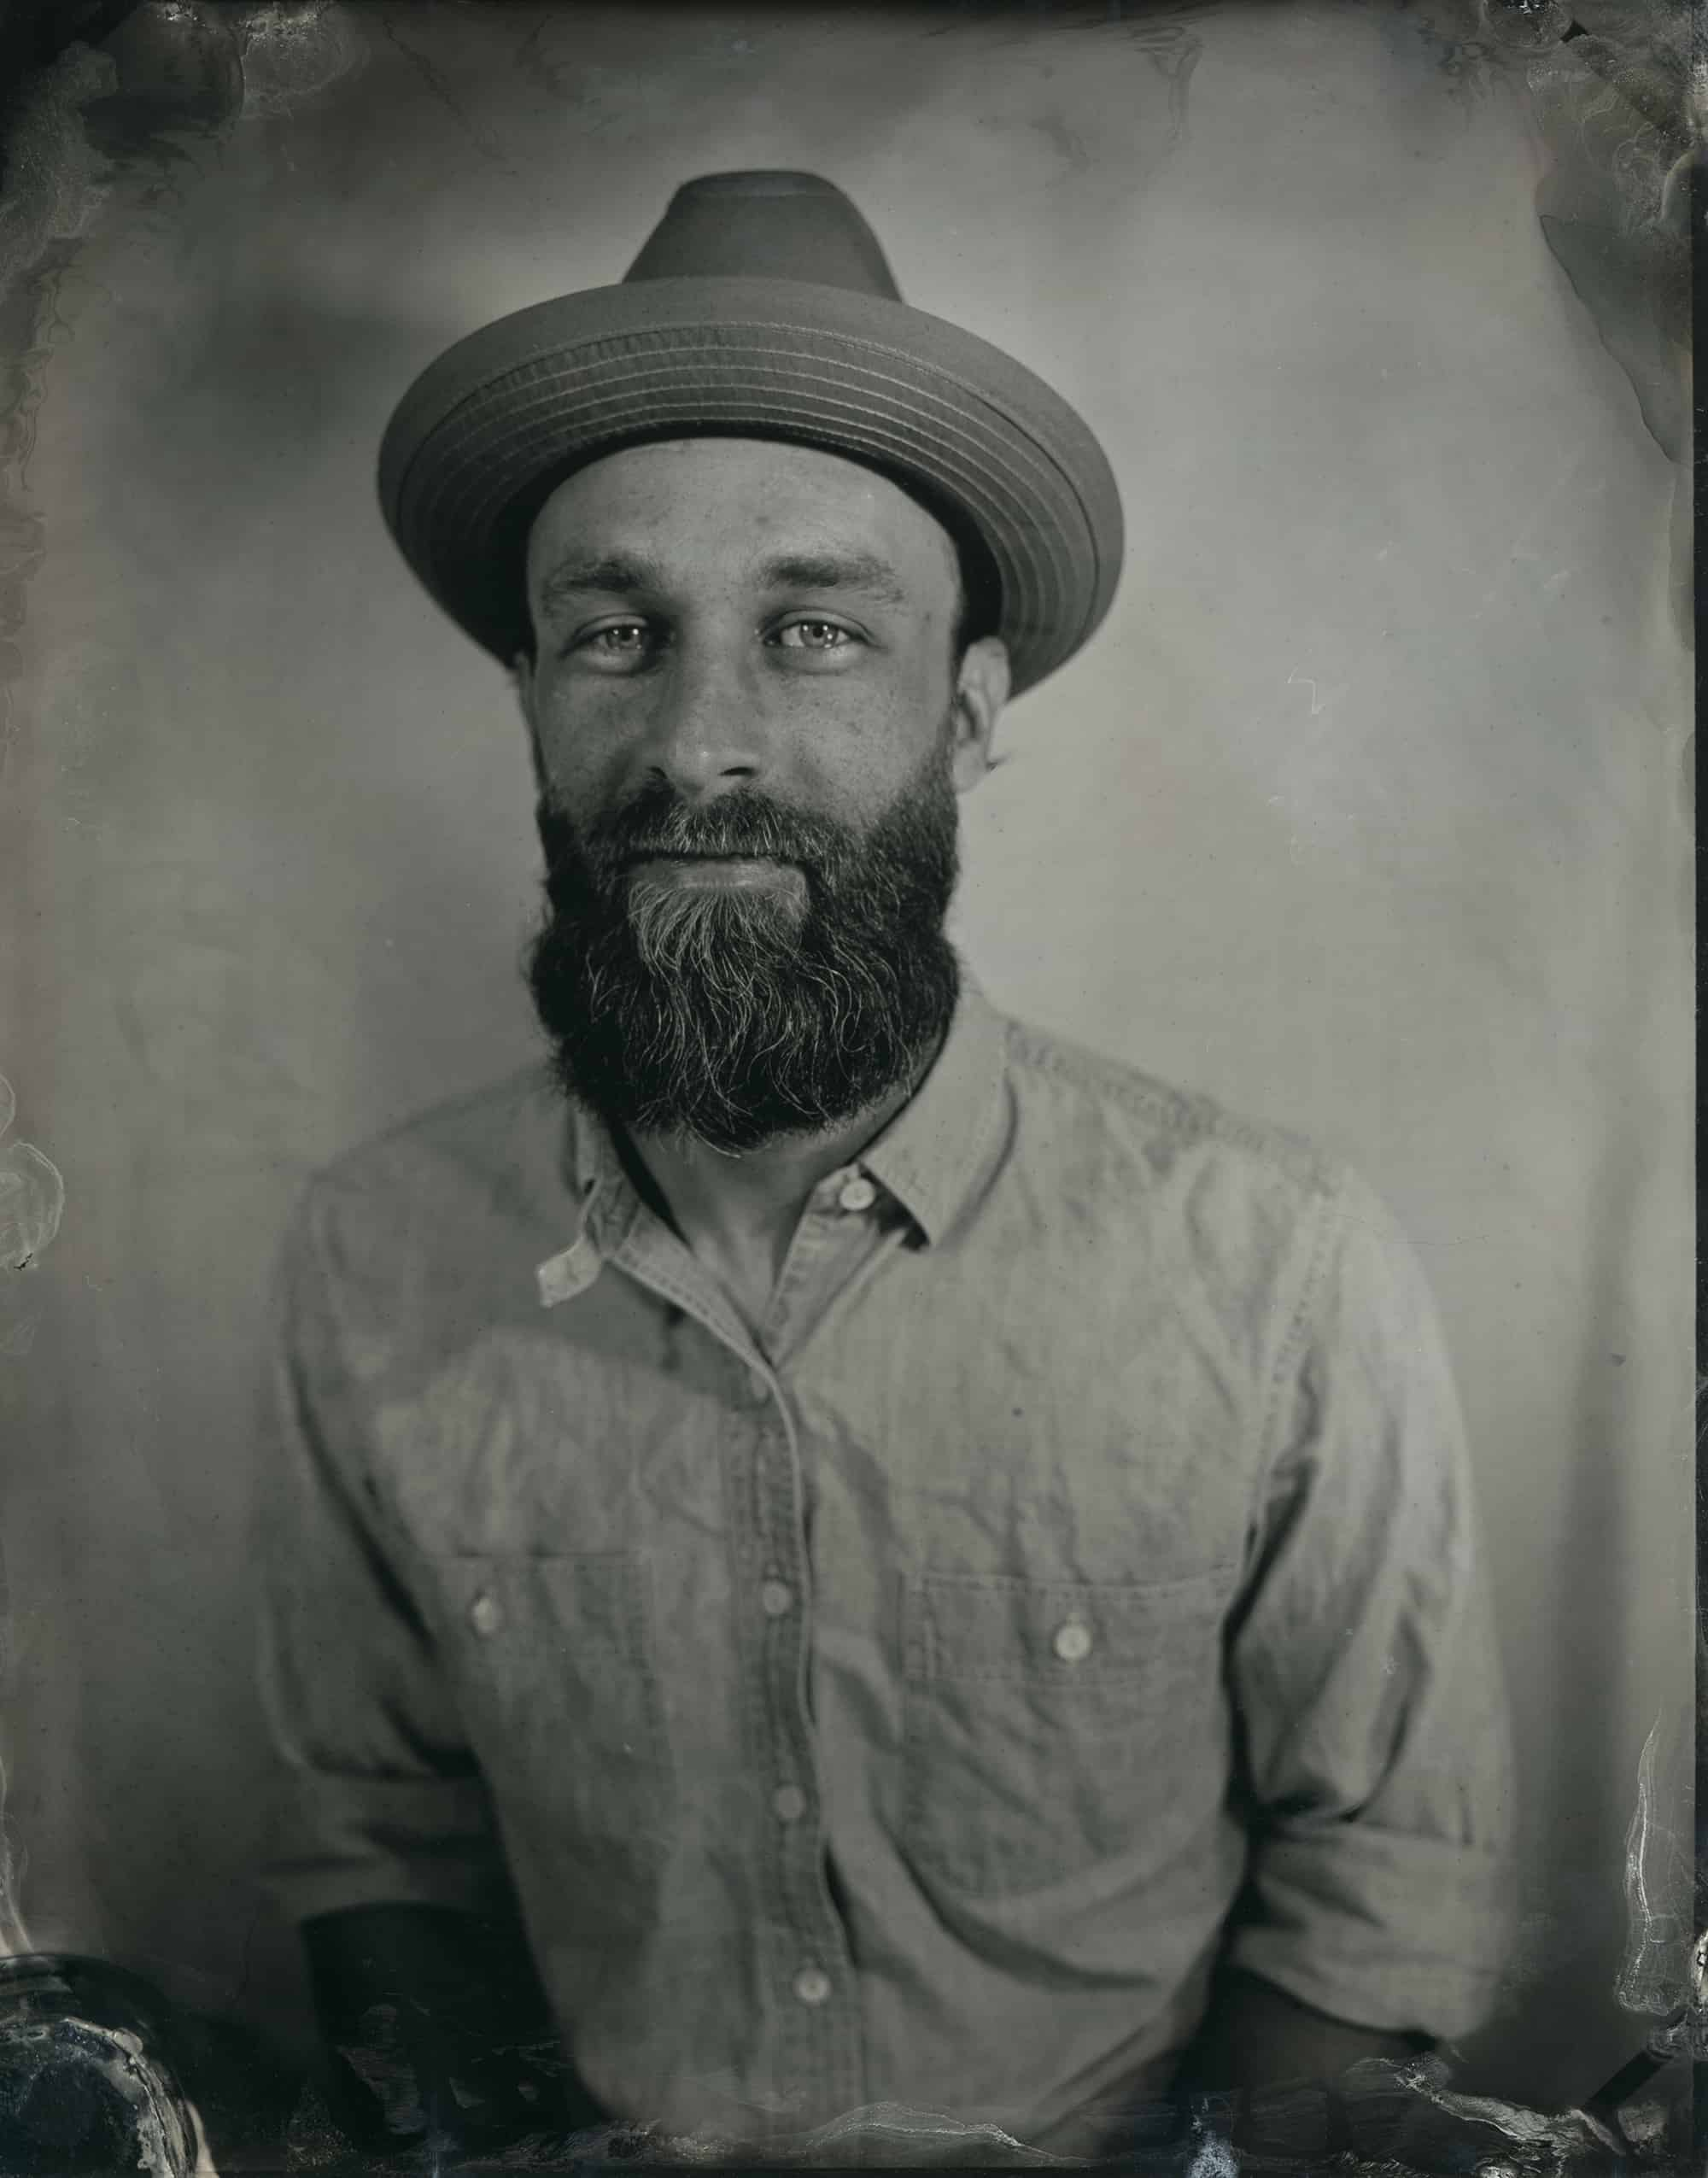 Tintype Portrait created in Atlanta, Georgia by Kate Lamb of Wild in Love Photo